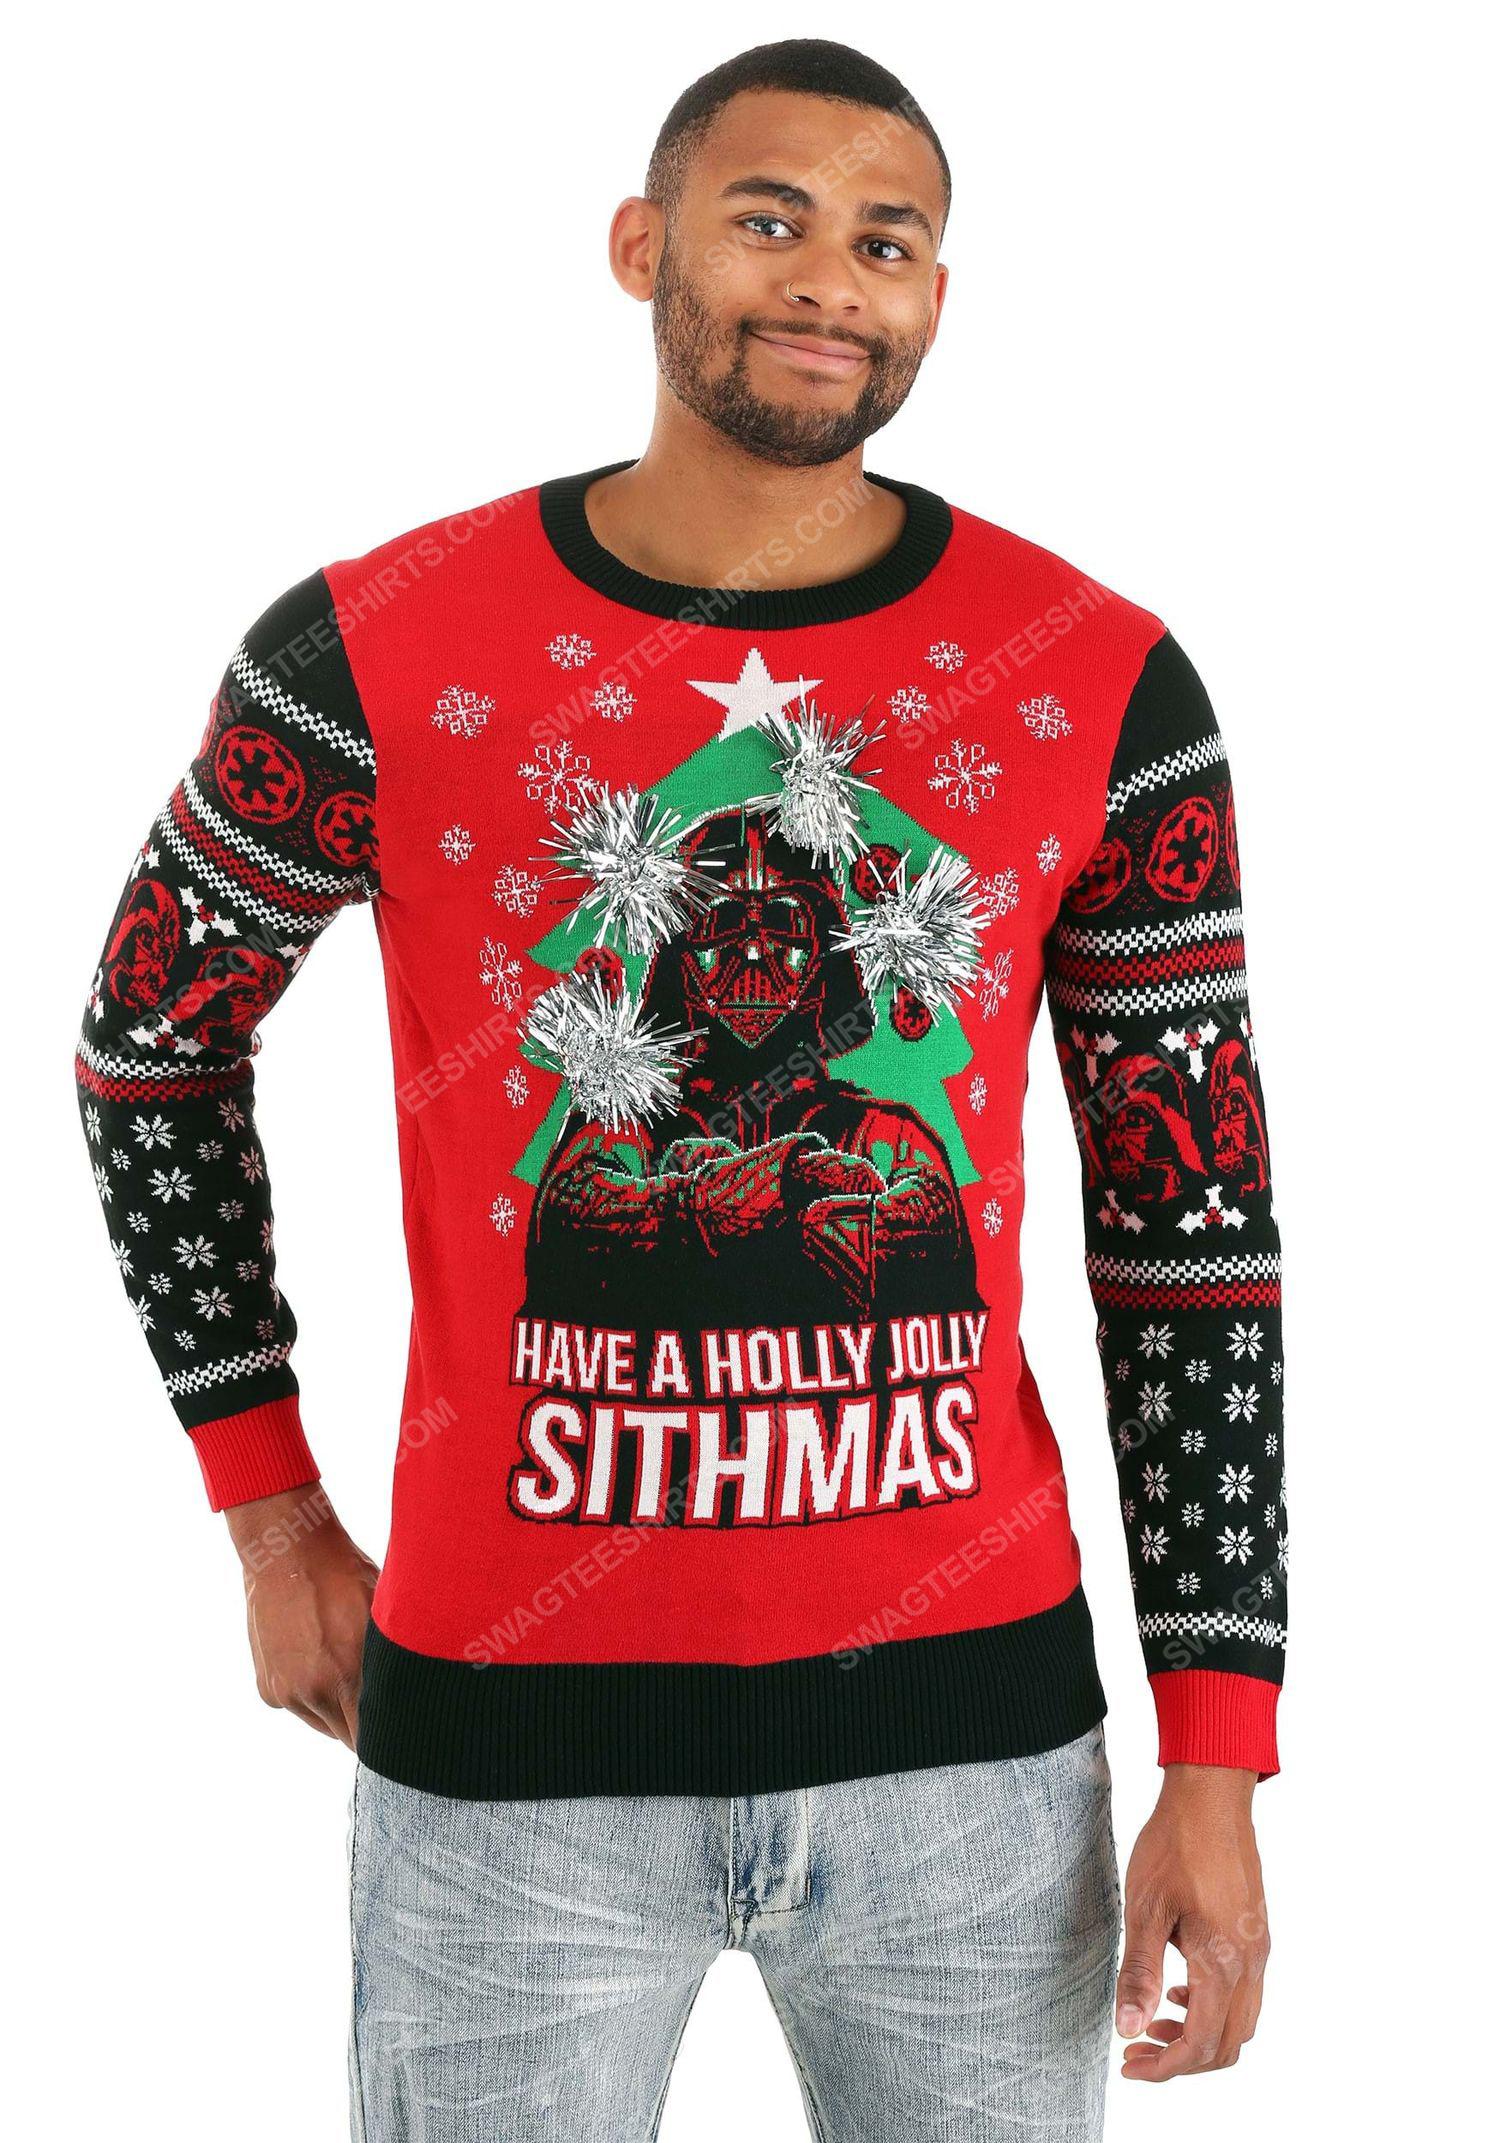 Have a holly jolly sithmas darth vader star wars full print ugly christmas sweater 2 - Copy